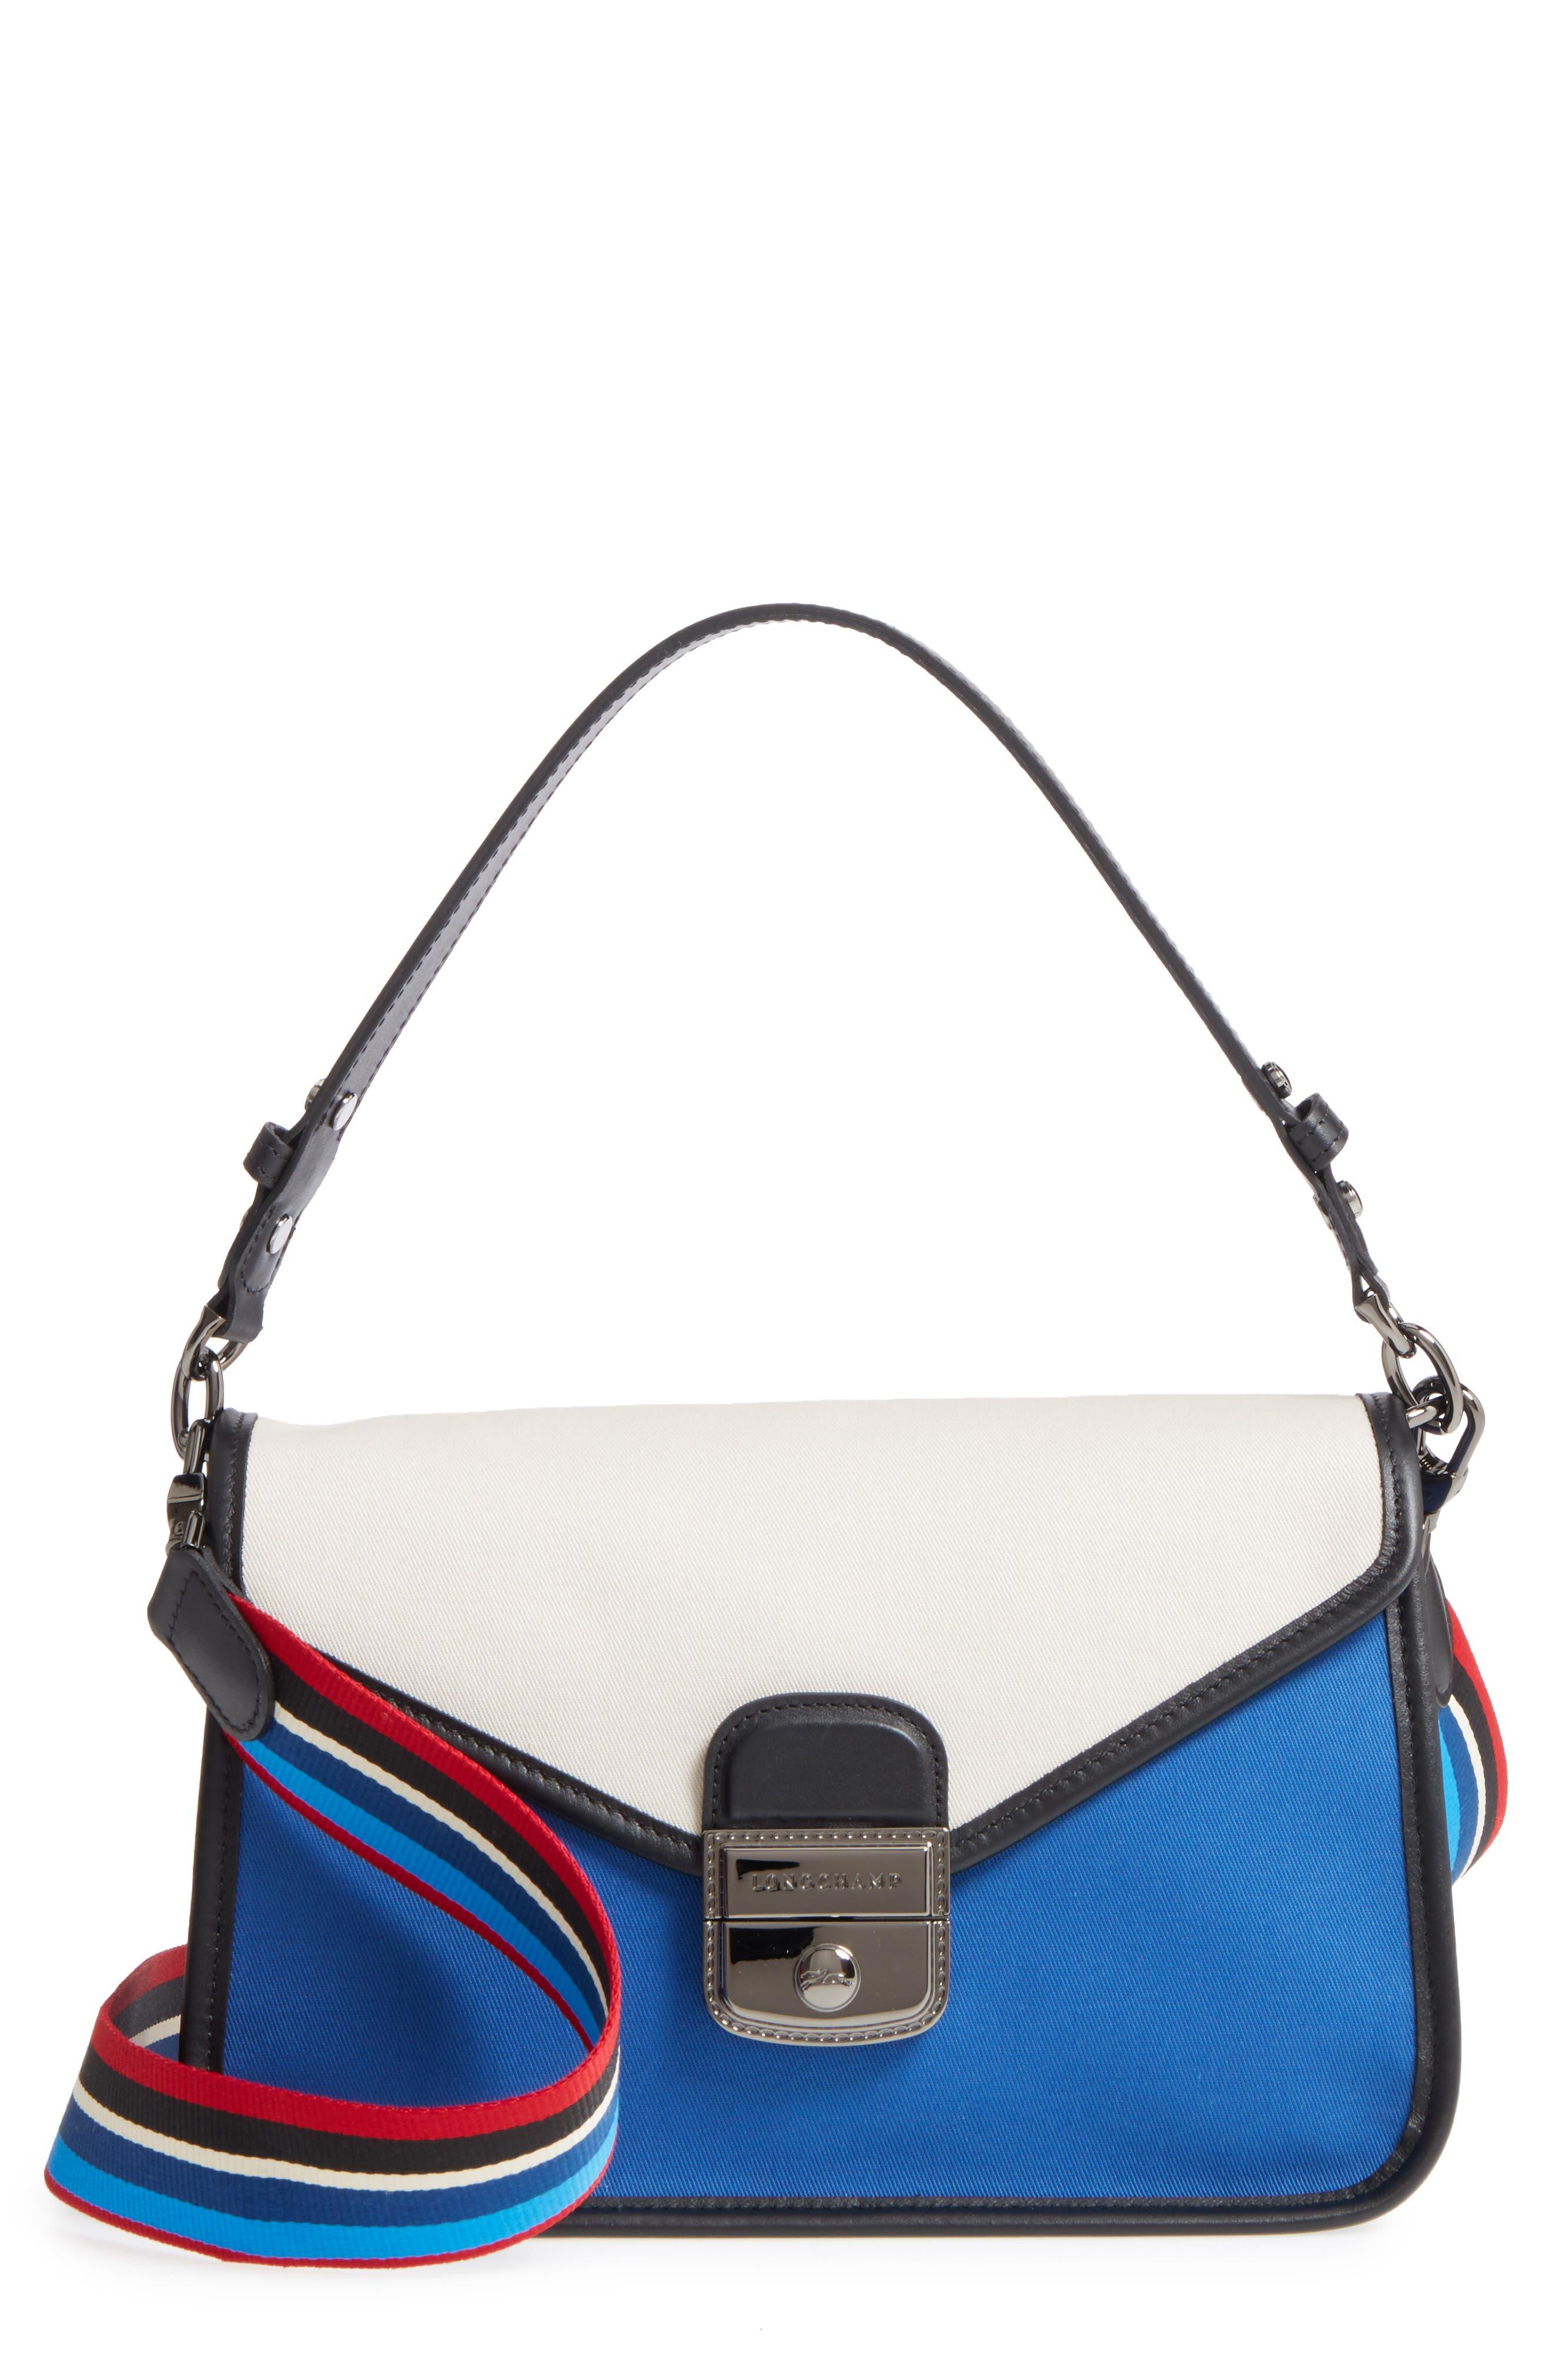 Main Image - Longchamp Mademoiselle Gabardine Canvas Shoulder Bag